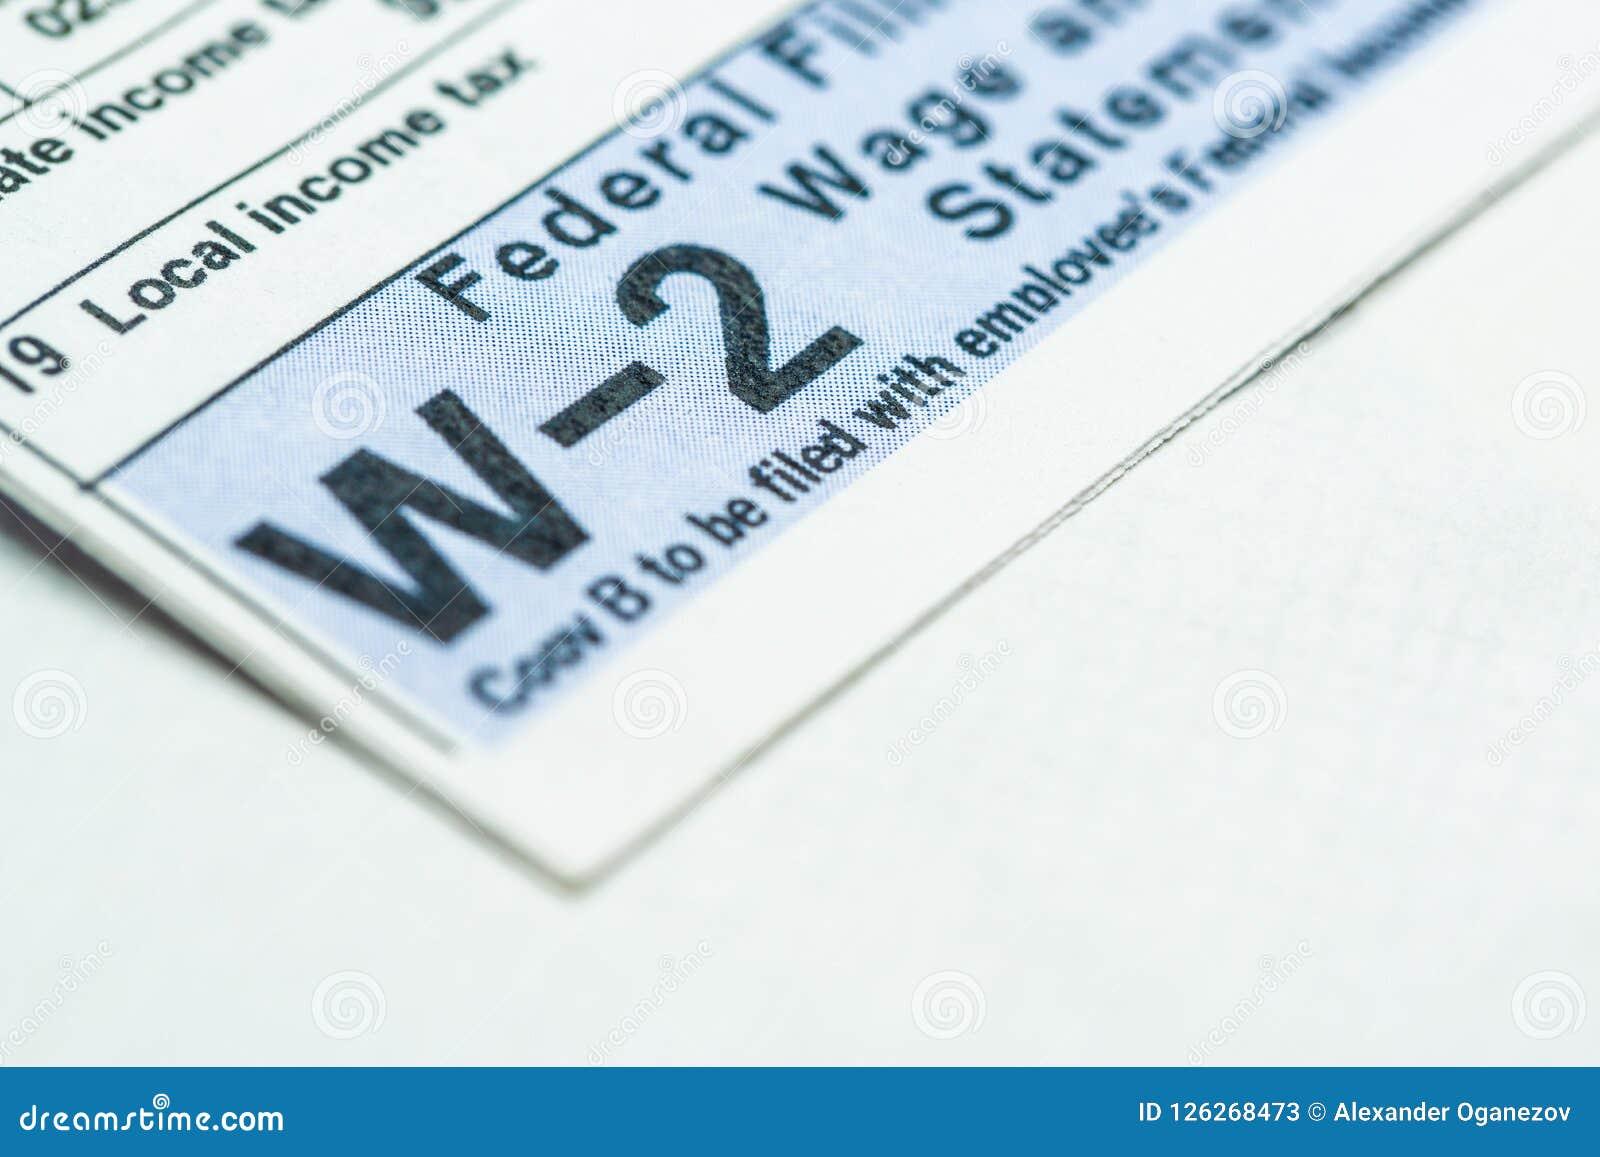 W-2 belastingsvorm op witte achtergrond